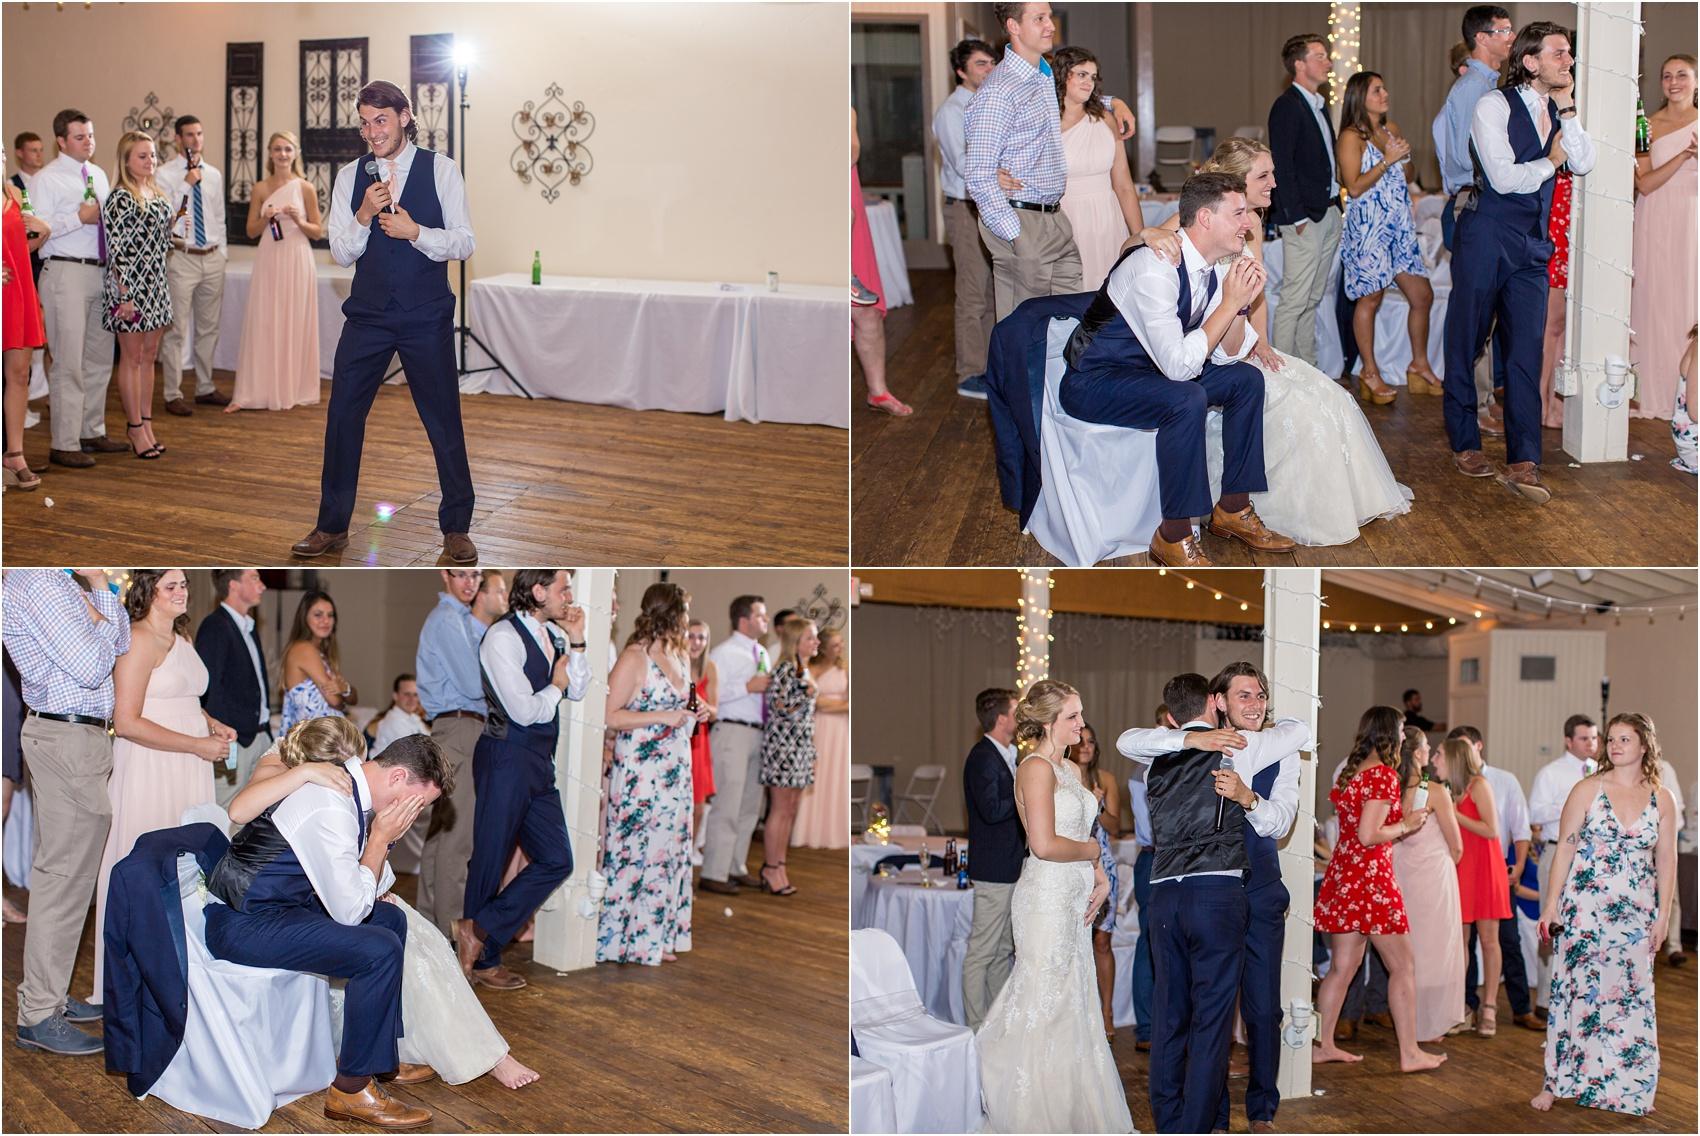 Savannah Eve Photography- Roper-Powell Wedding- Blog-77.jpg